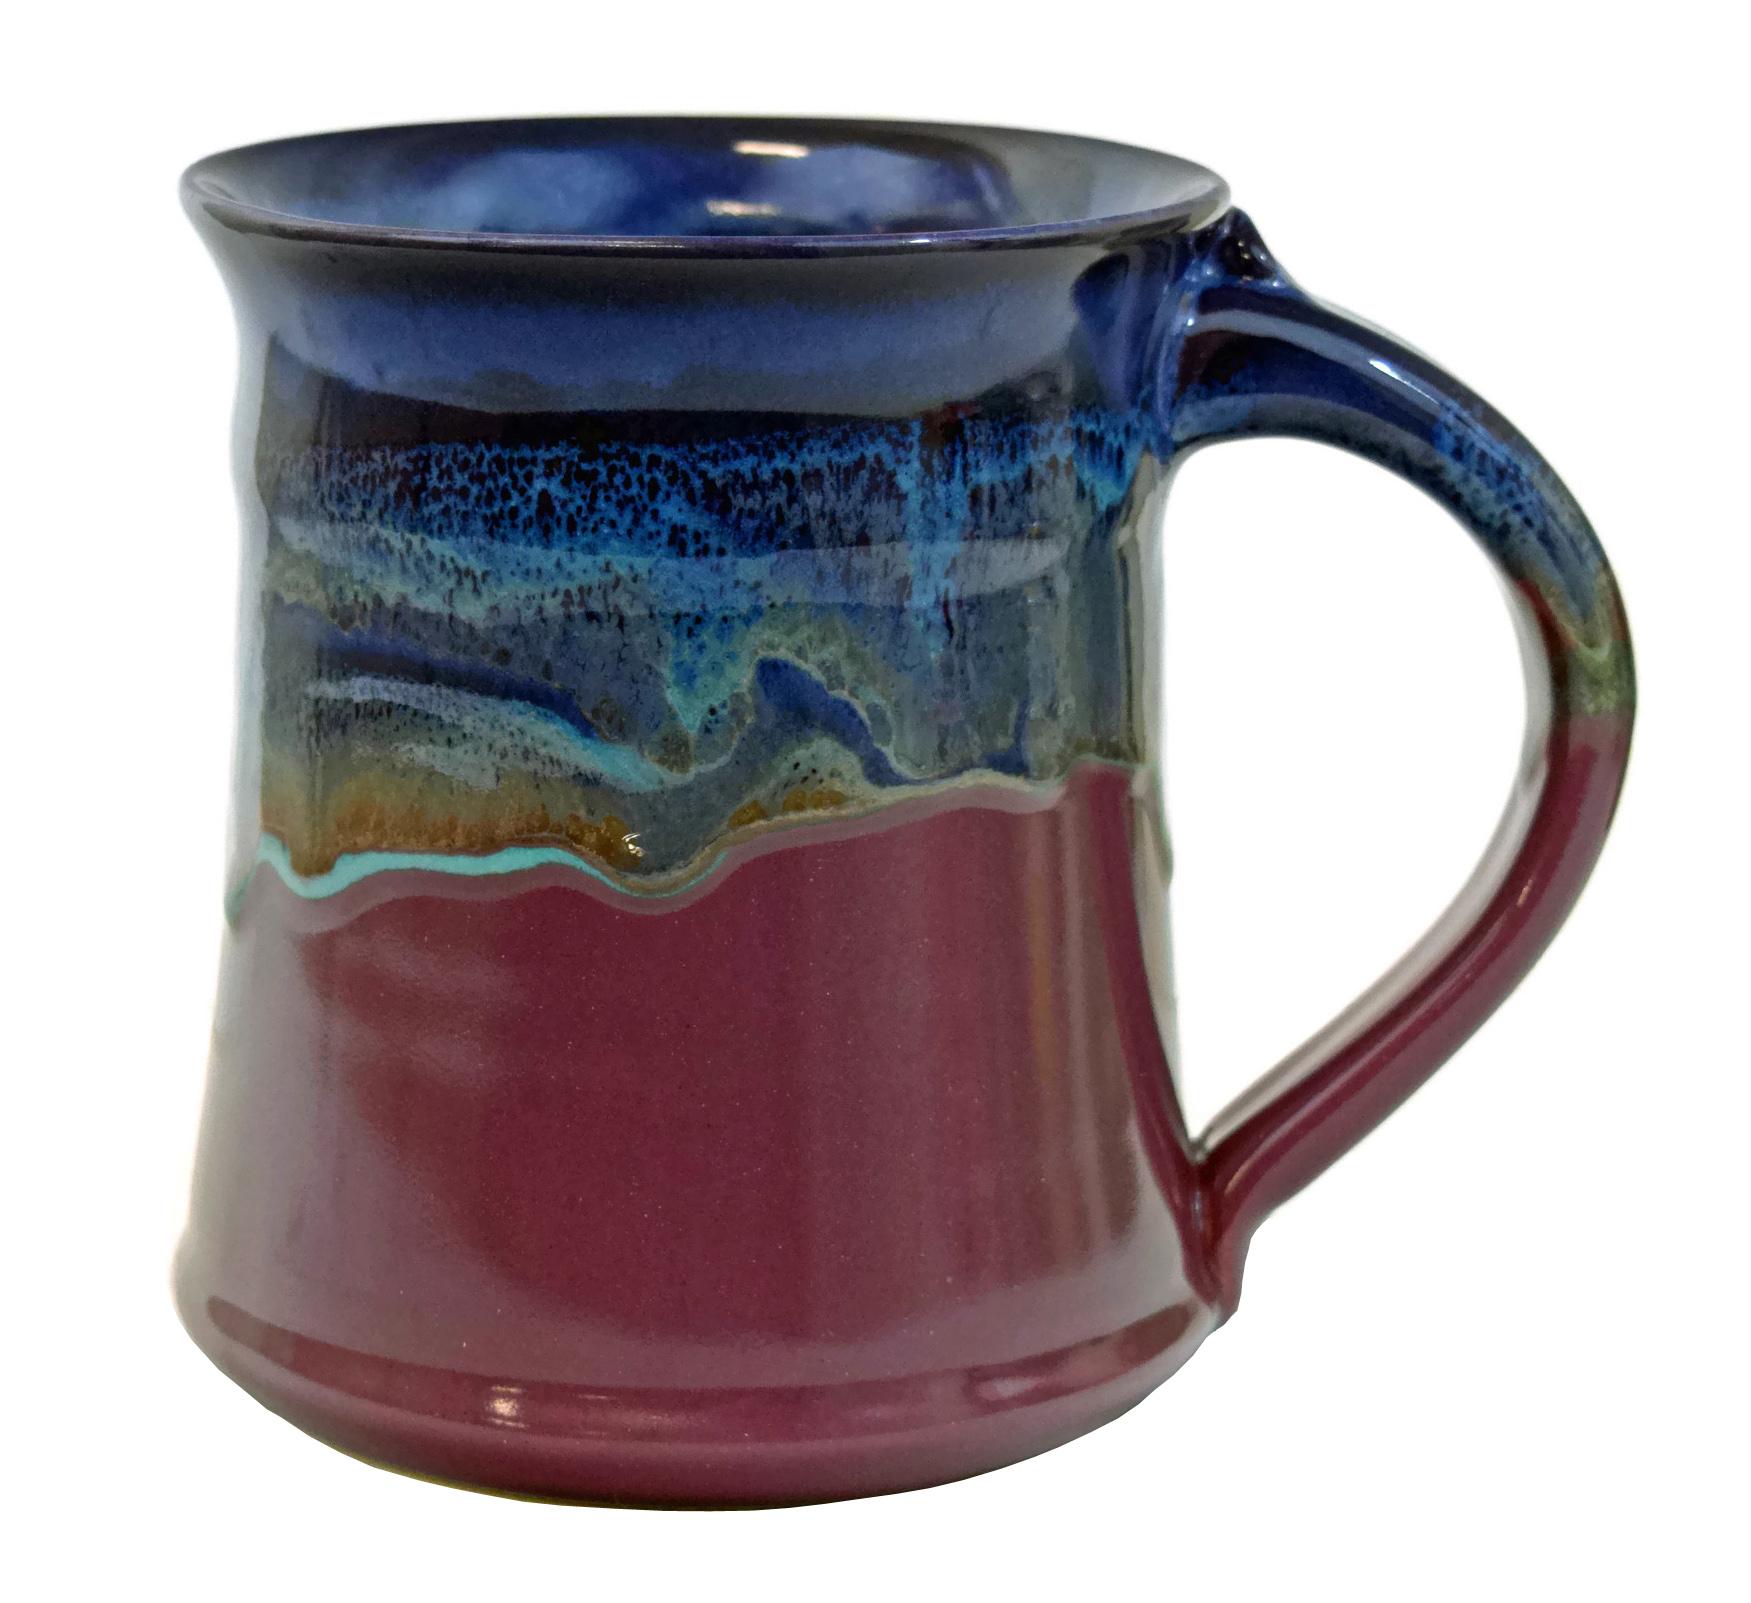 Clay in motion handmade ceramic medium mug coffee cup 16oz for Passion coffee